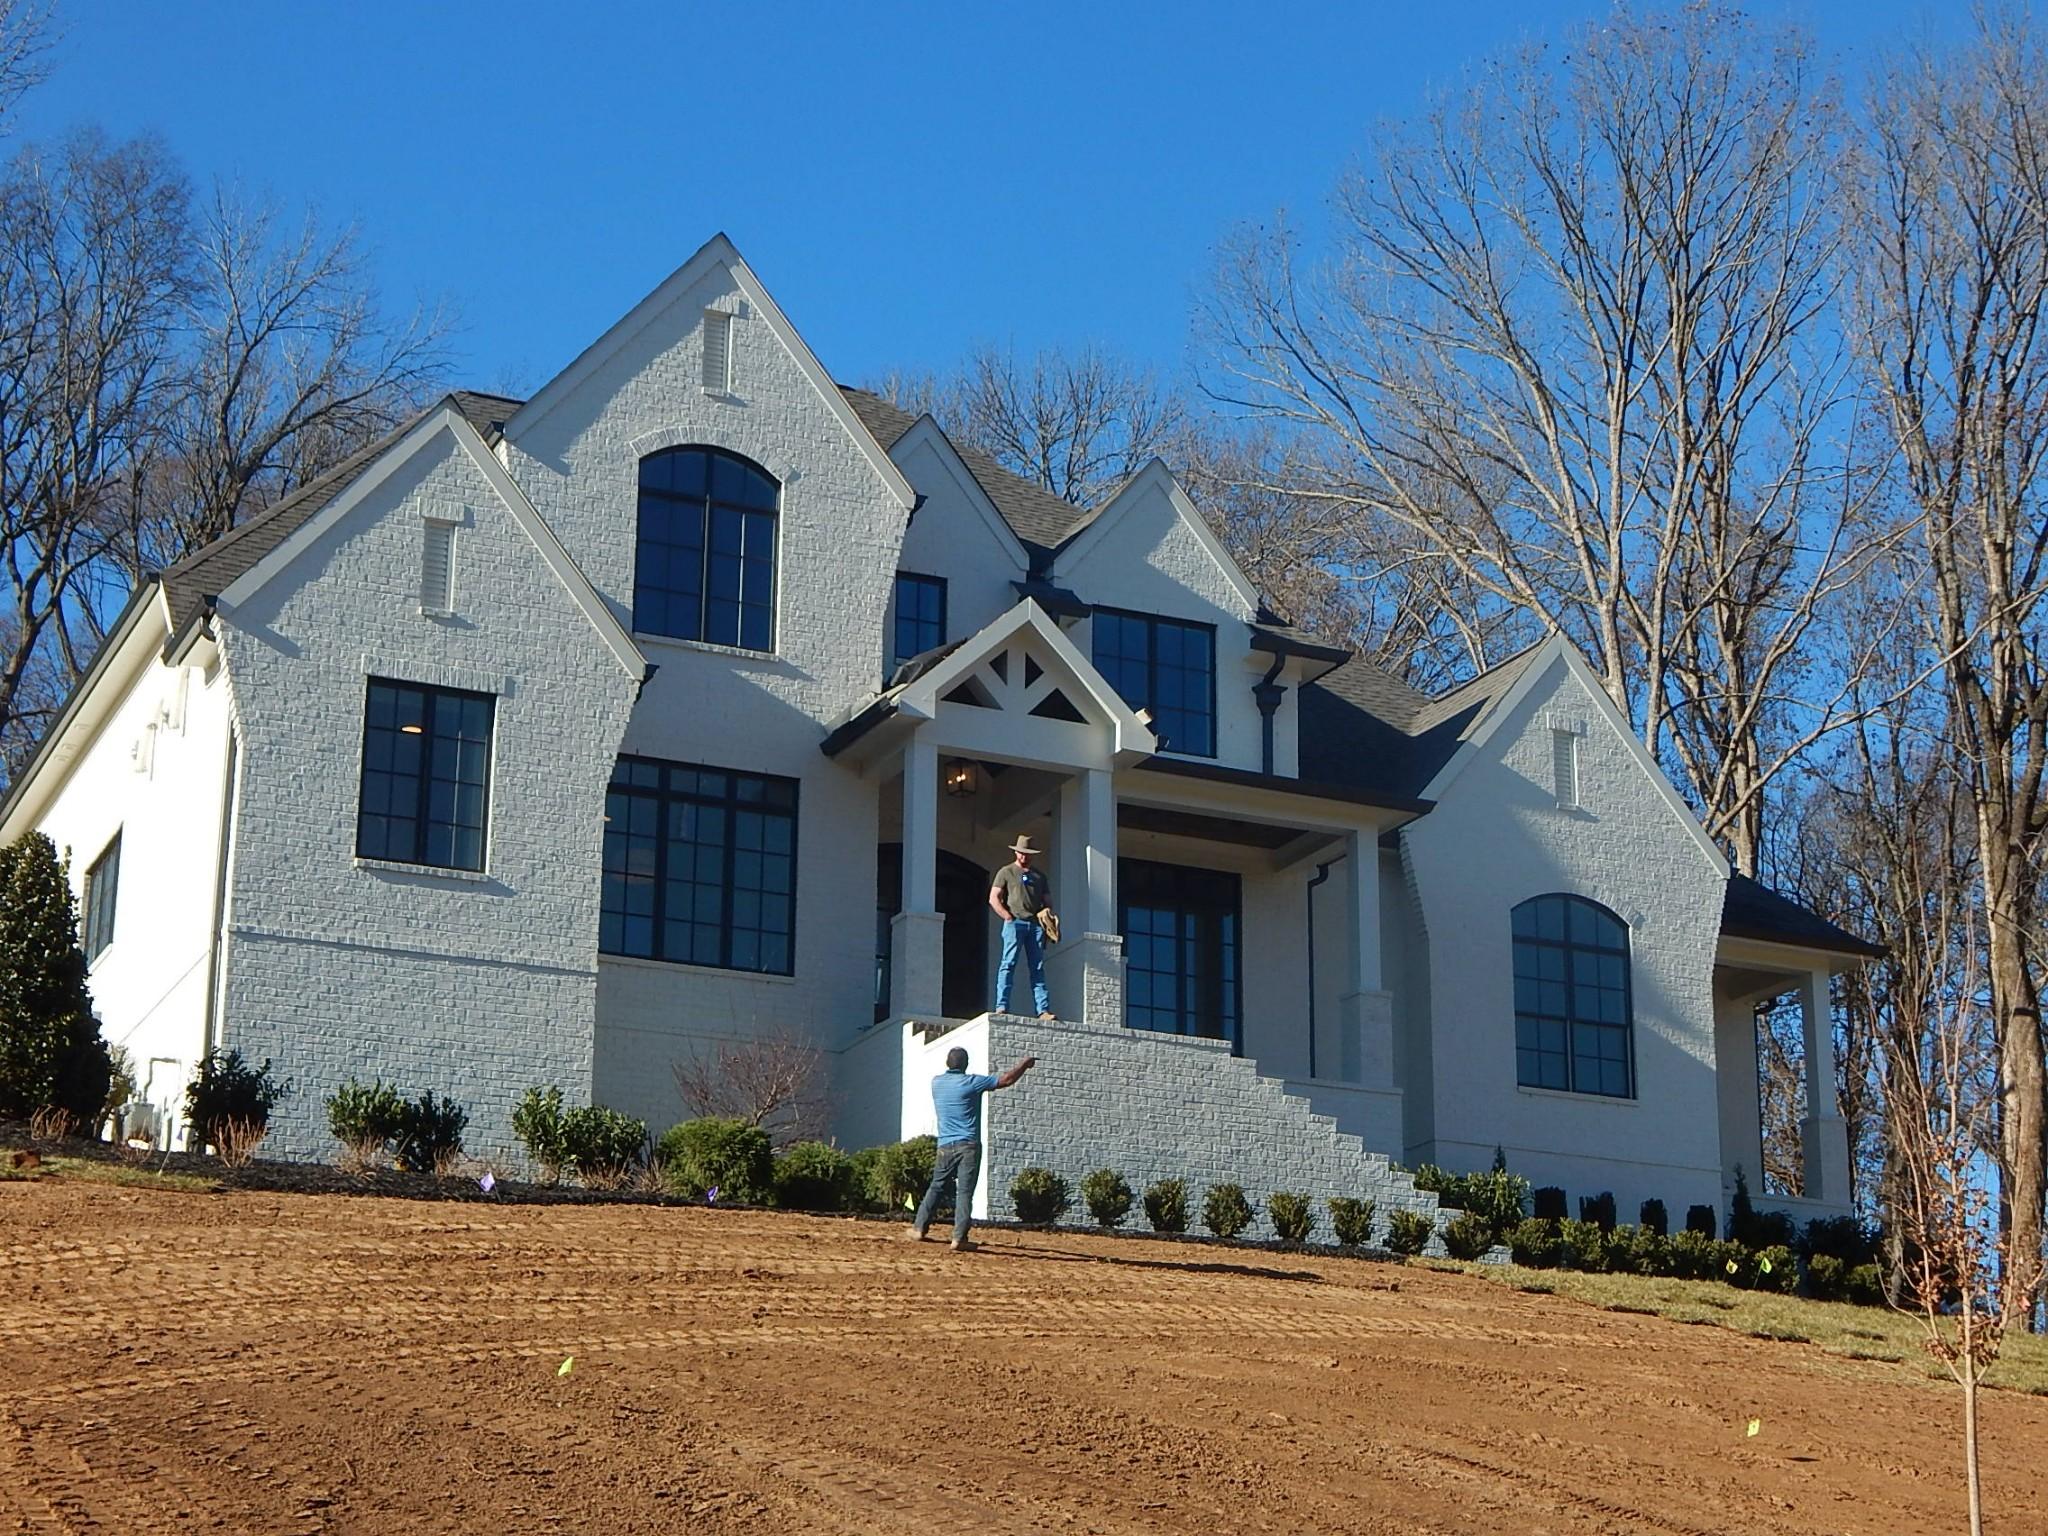 1588 Eastwood Dr, Lot 107 Property Photo